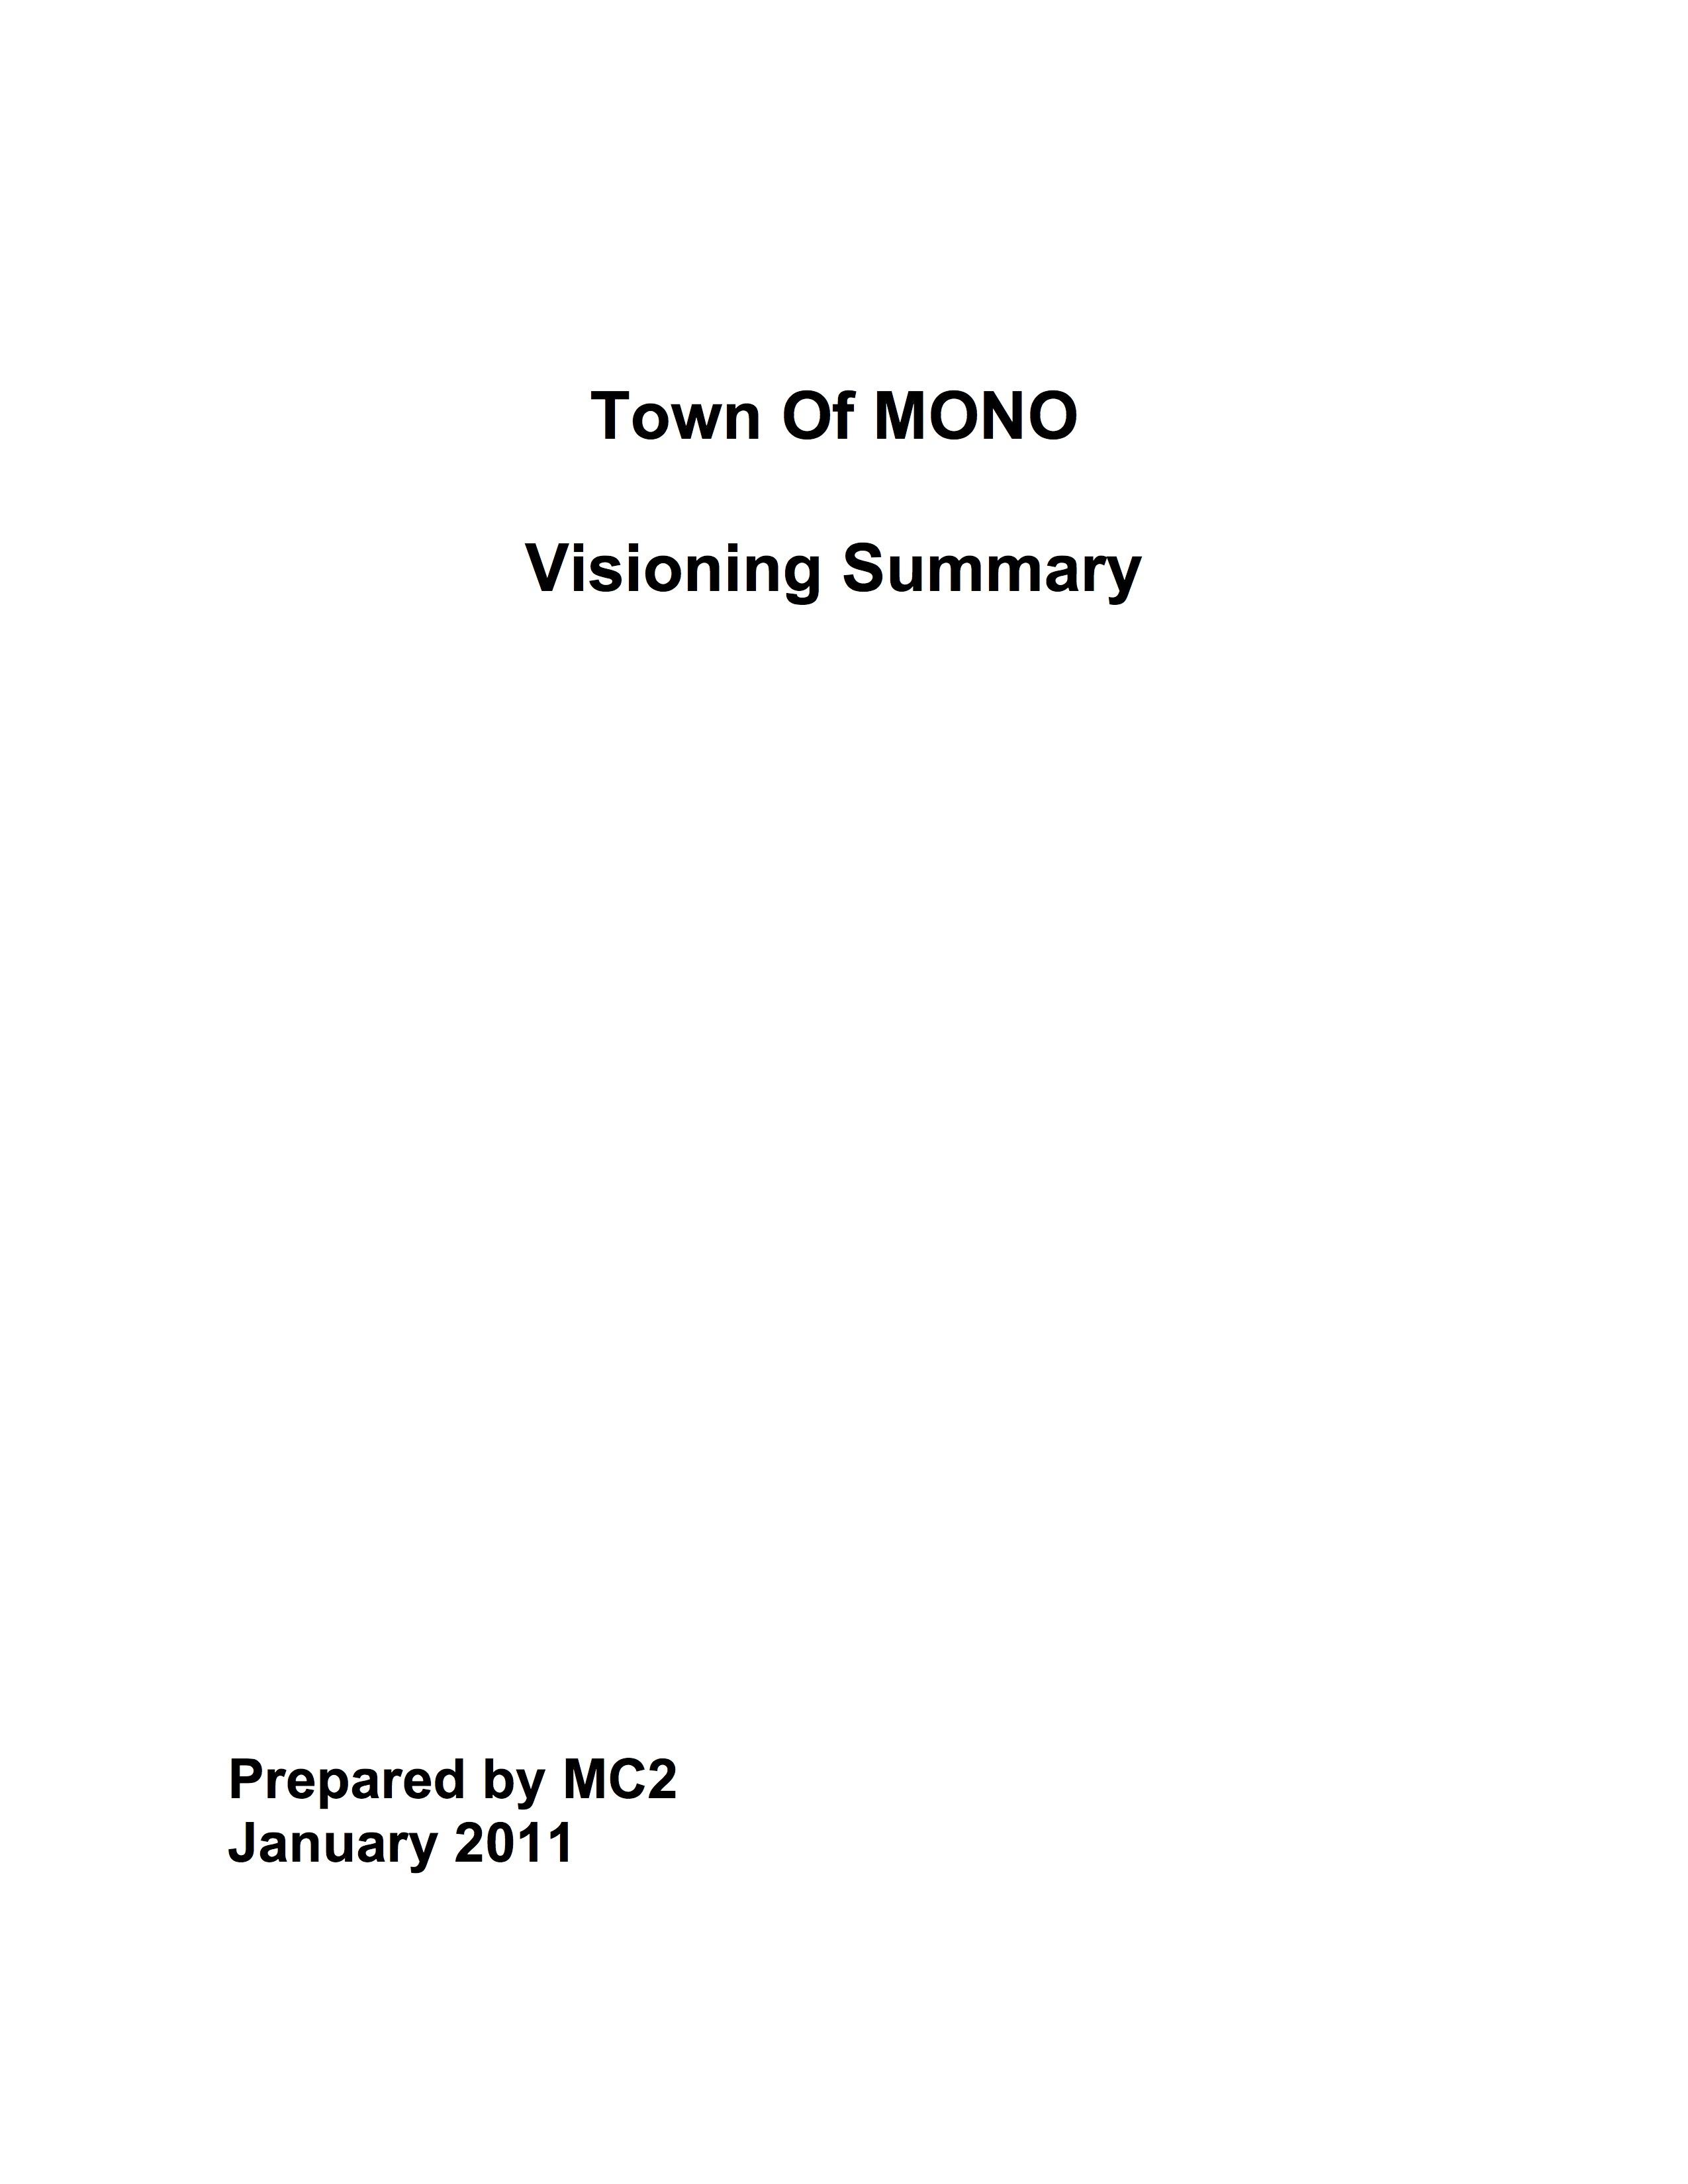 Mono Vision Summary